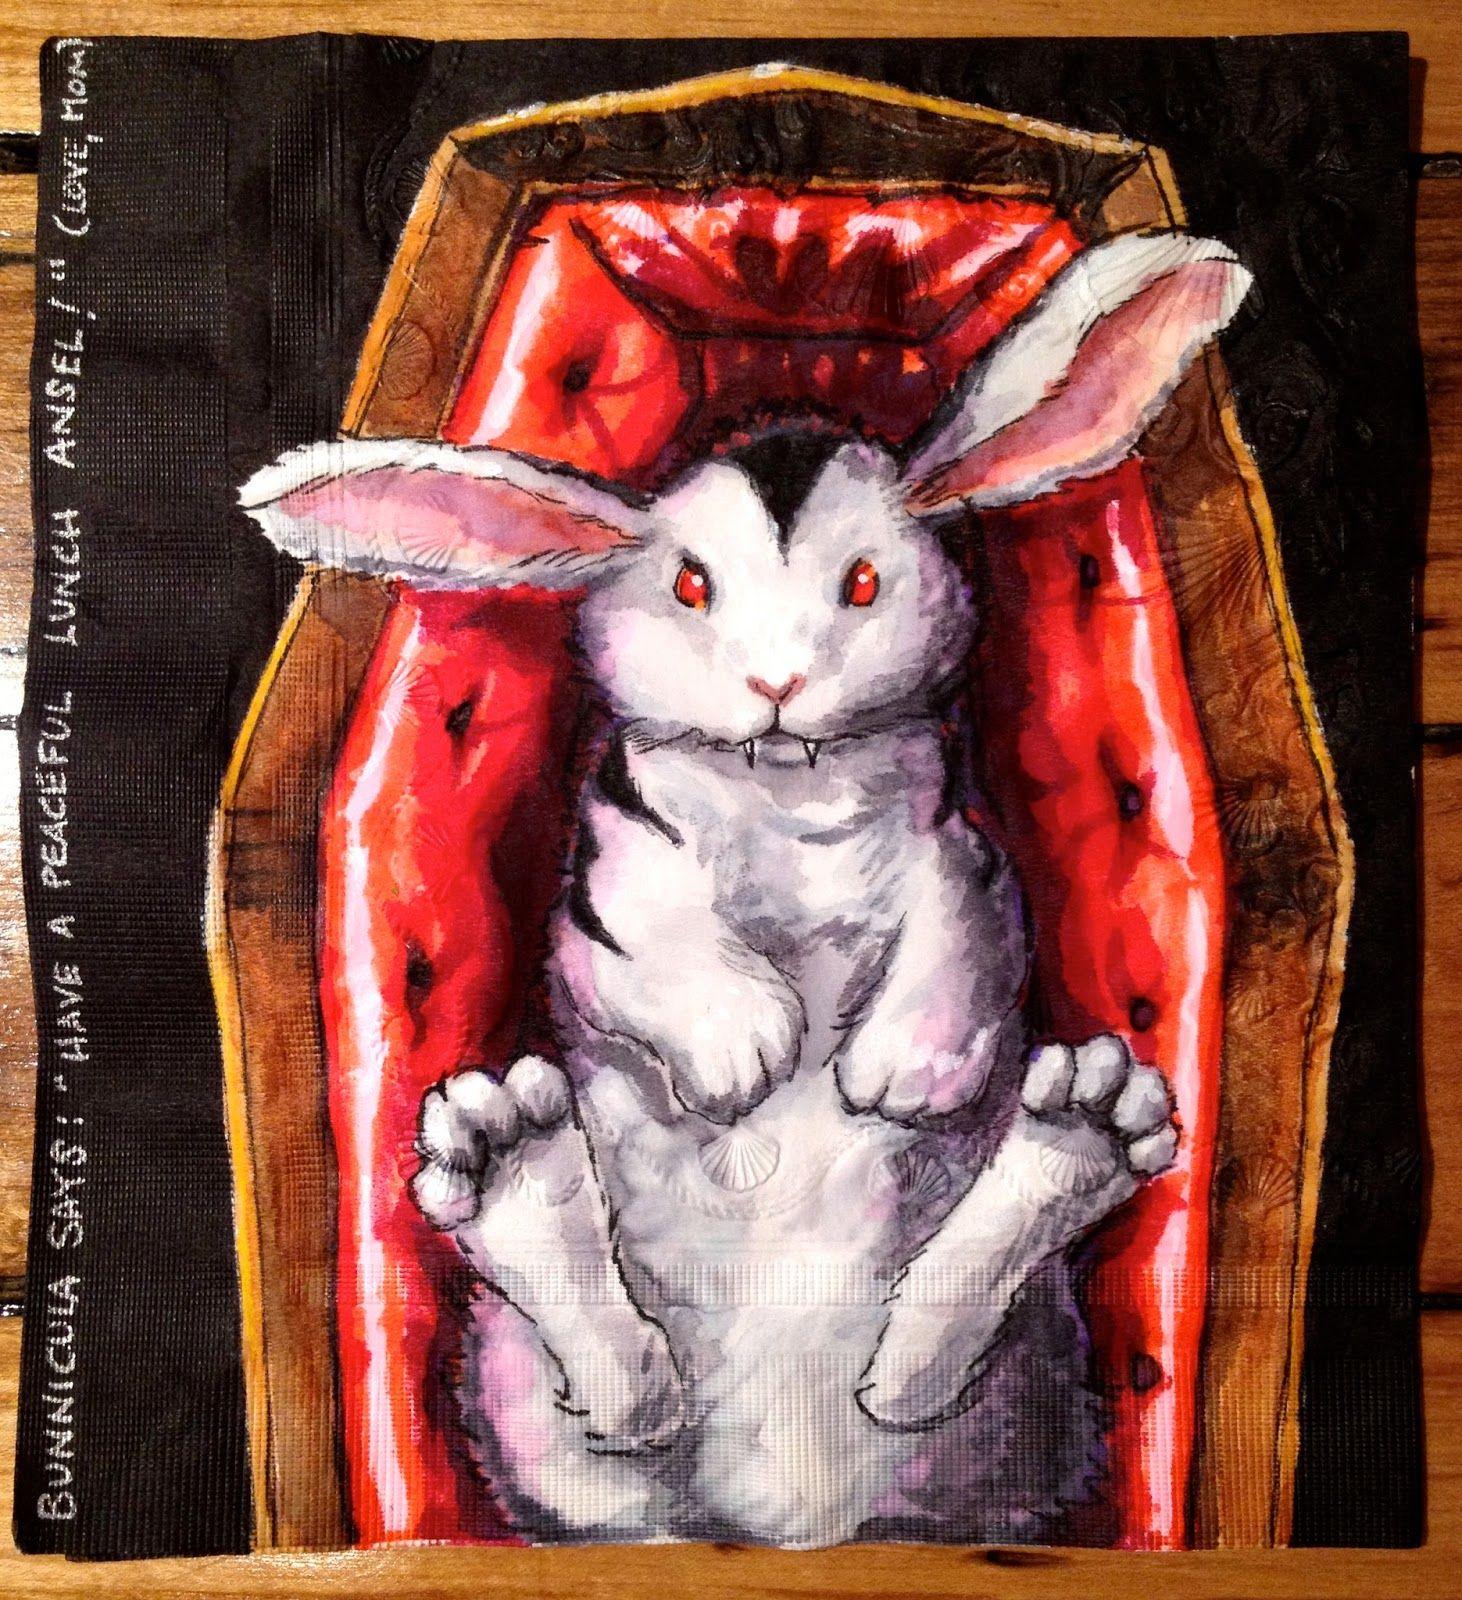 Daily Napkins Vampire Bunny In Coffin Rabbit Painting Halloween Art Kawaii Halloween White tomatoes reading bunnicula